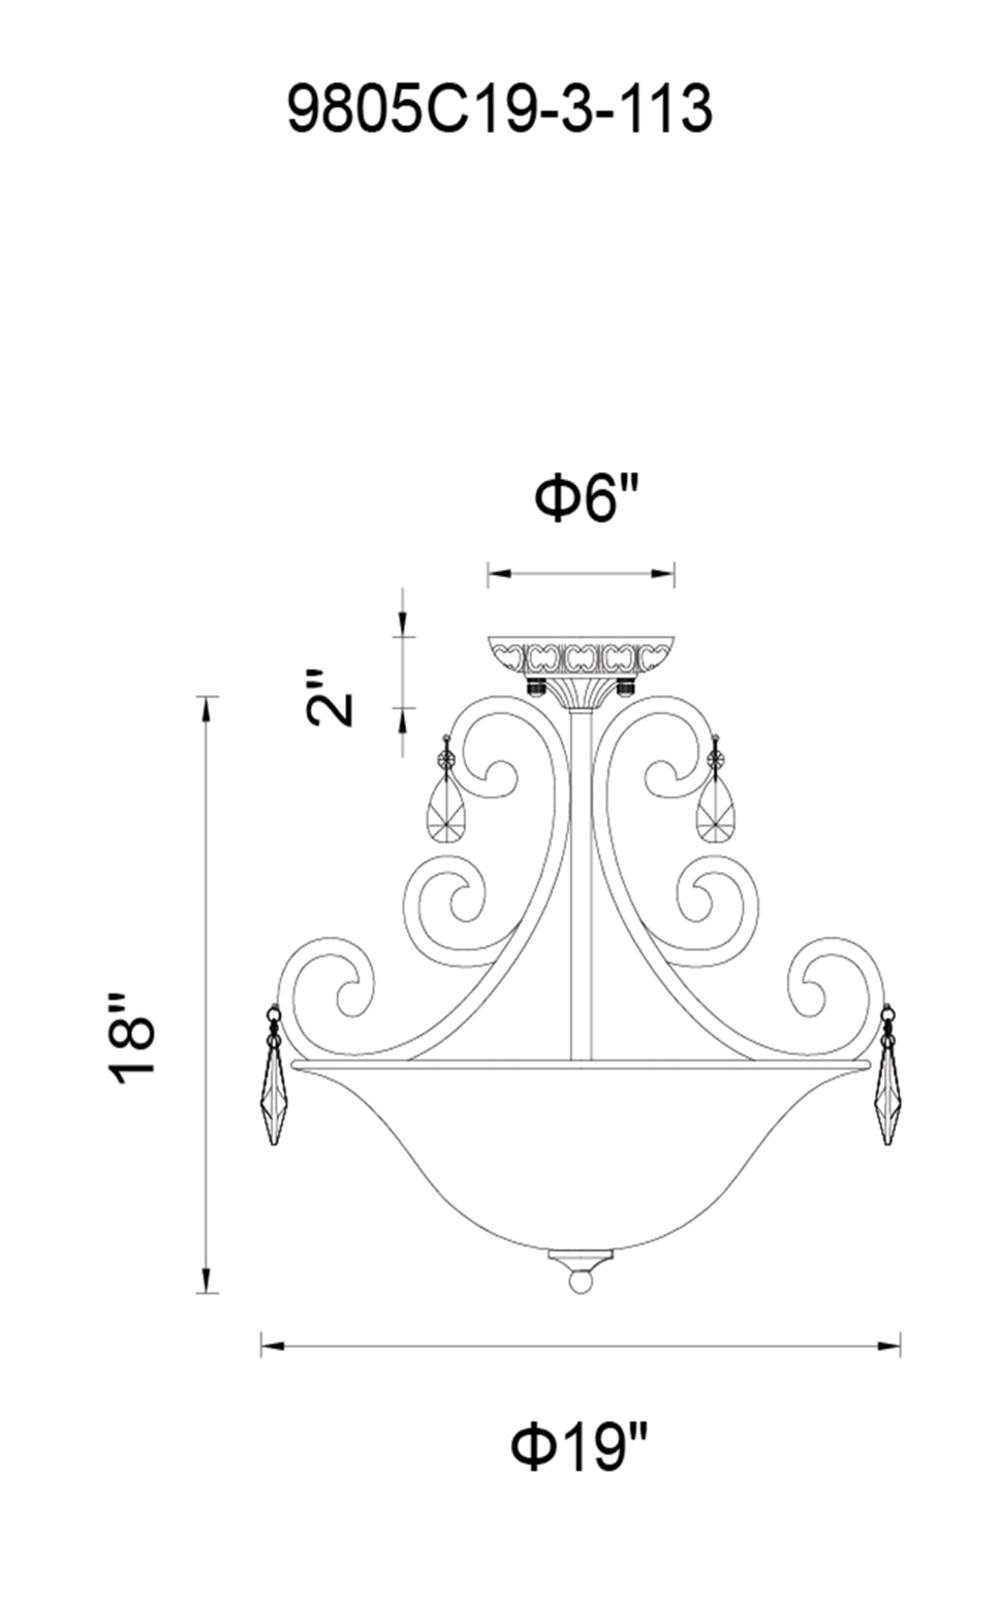 CWI Lighting Shakira 3 Light Bowl Flush Mount With Dark Bronze Model: 9805C19-3-113 Line Drawing